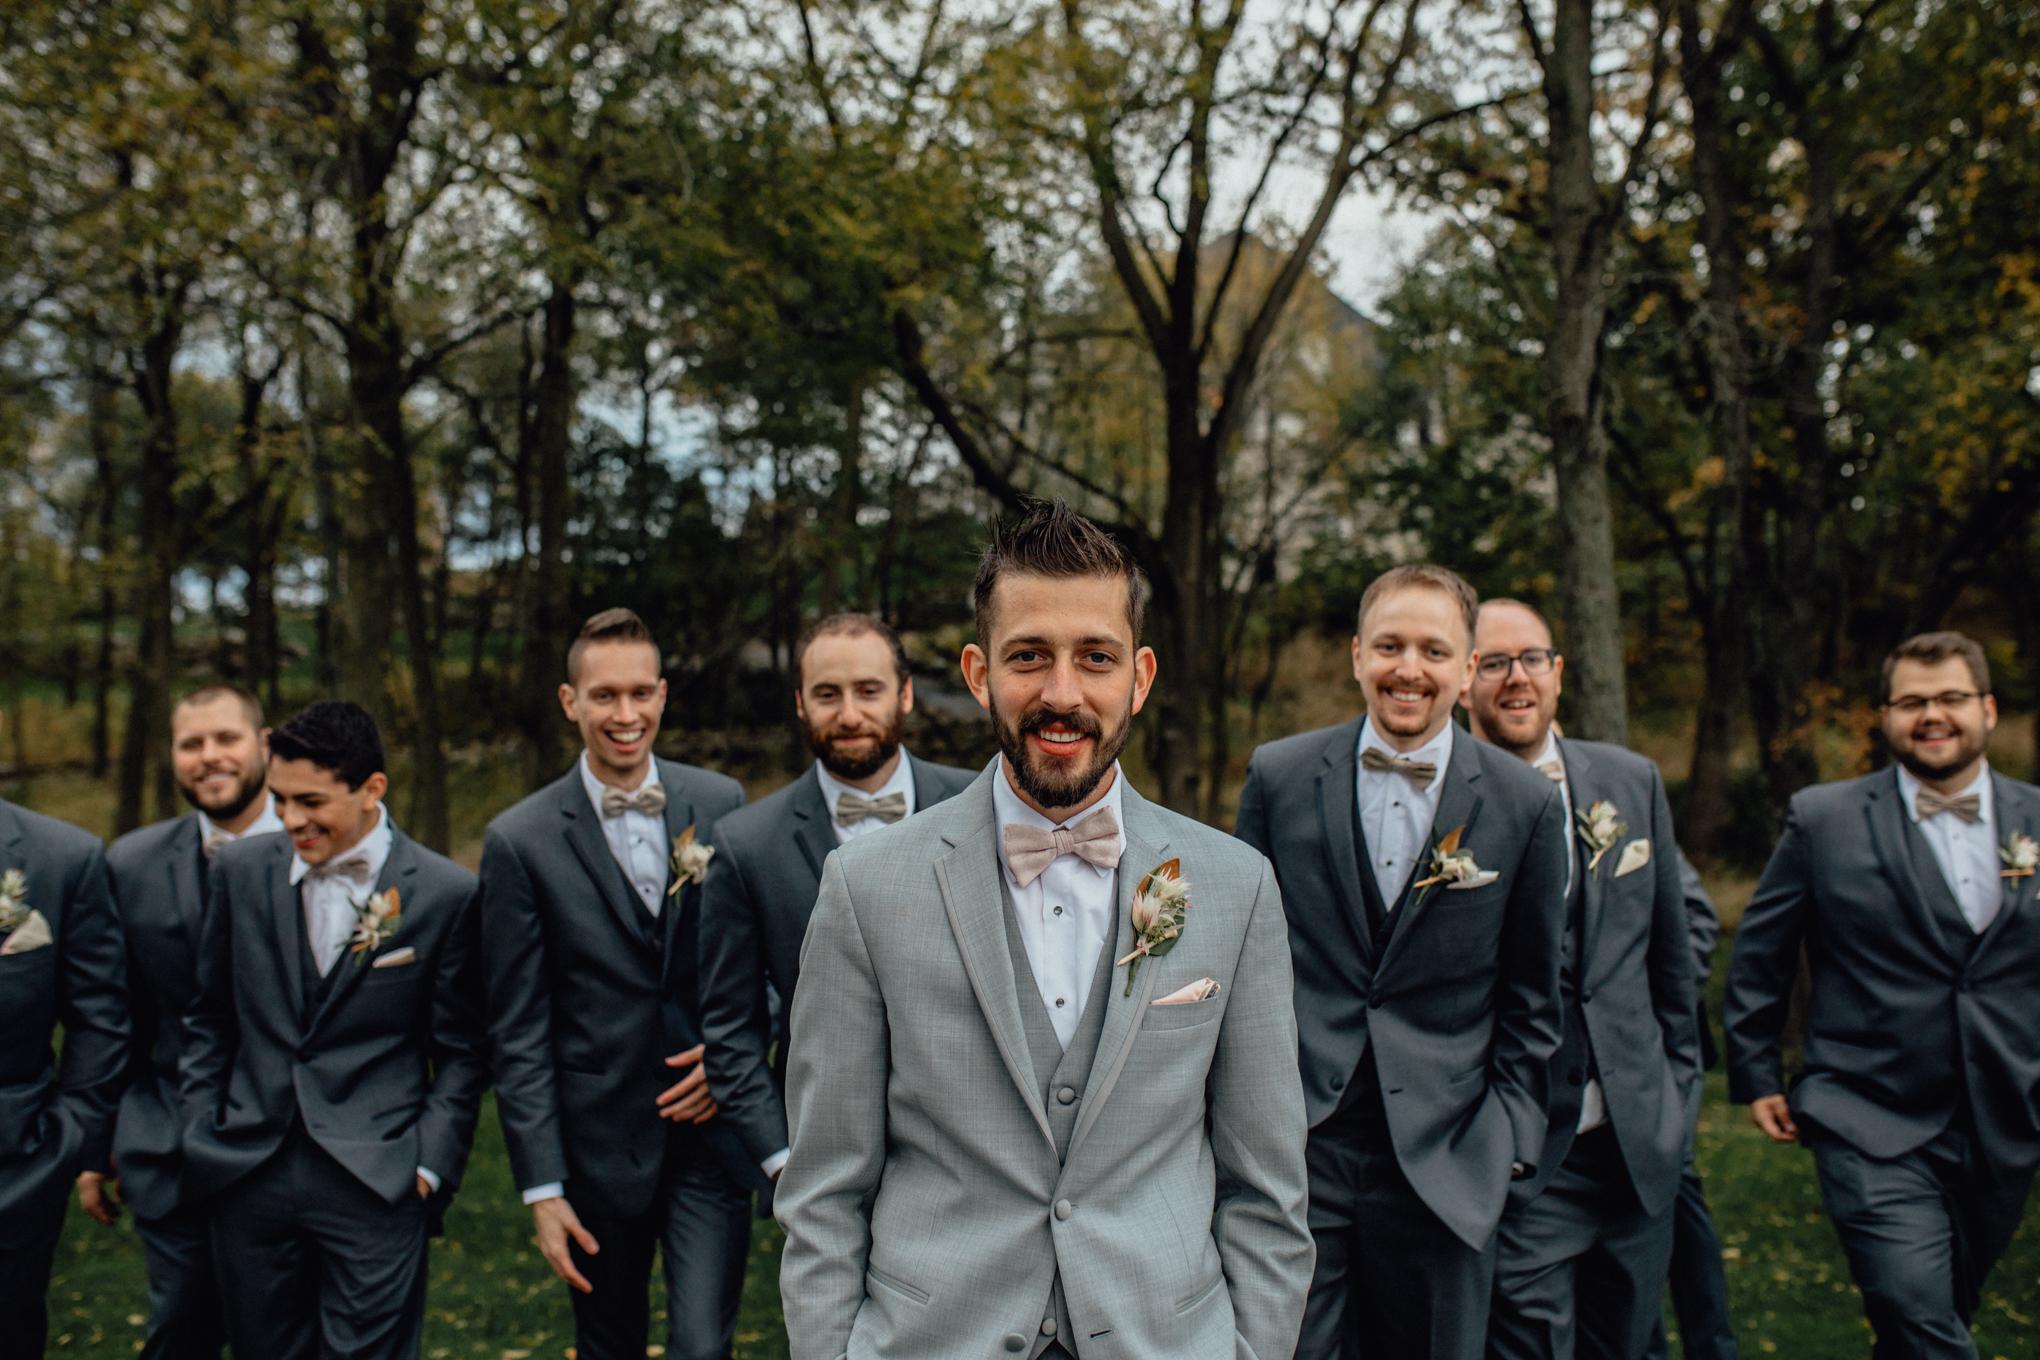 groom-walking-with-groomsmen-in-grass.jpg